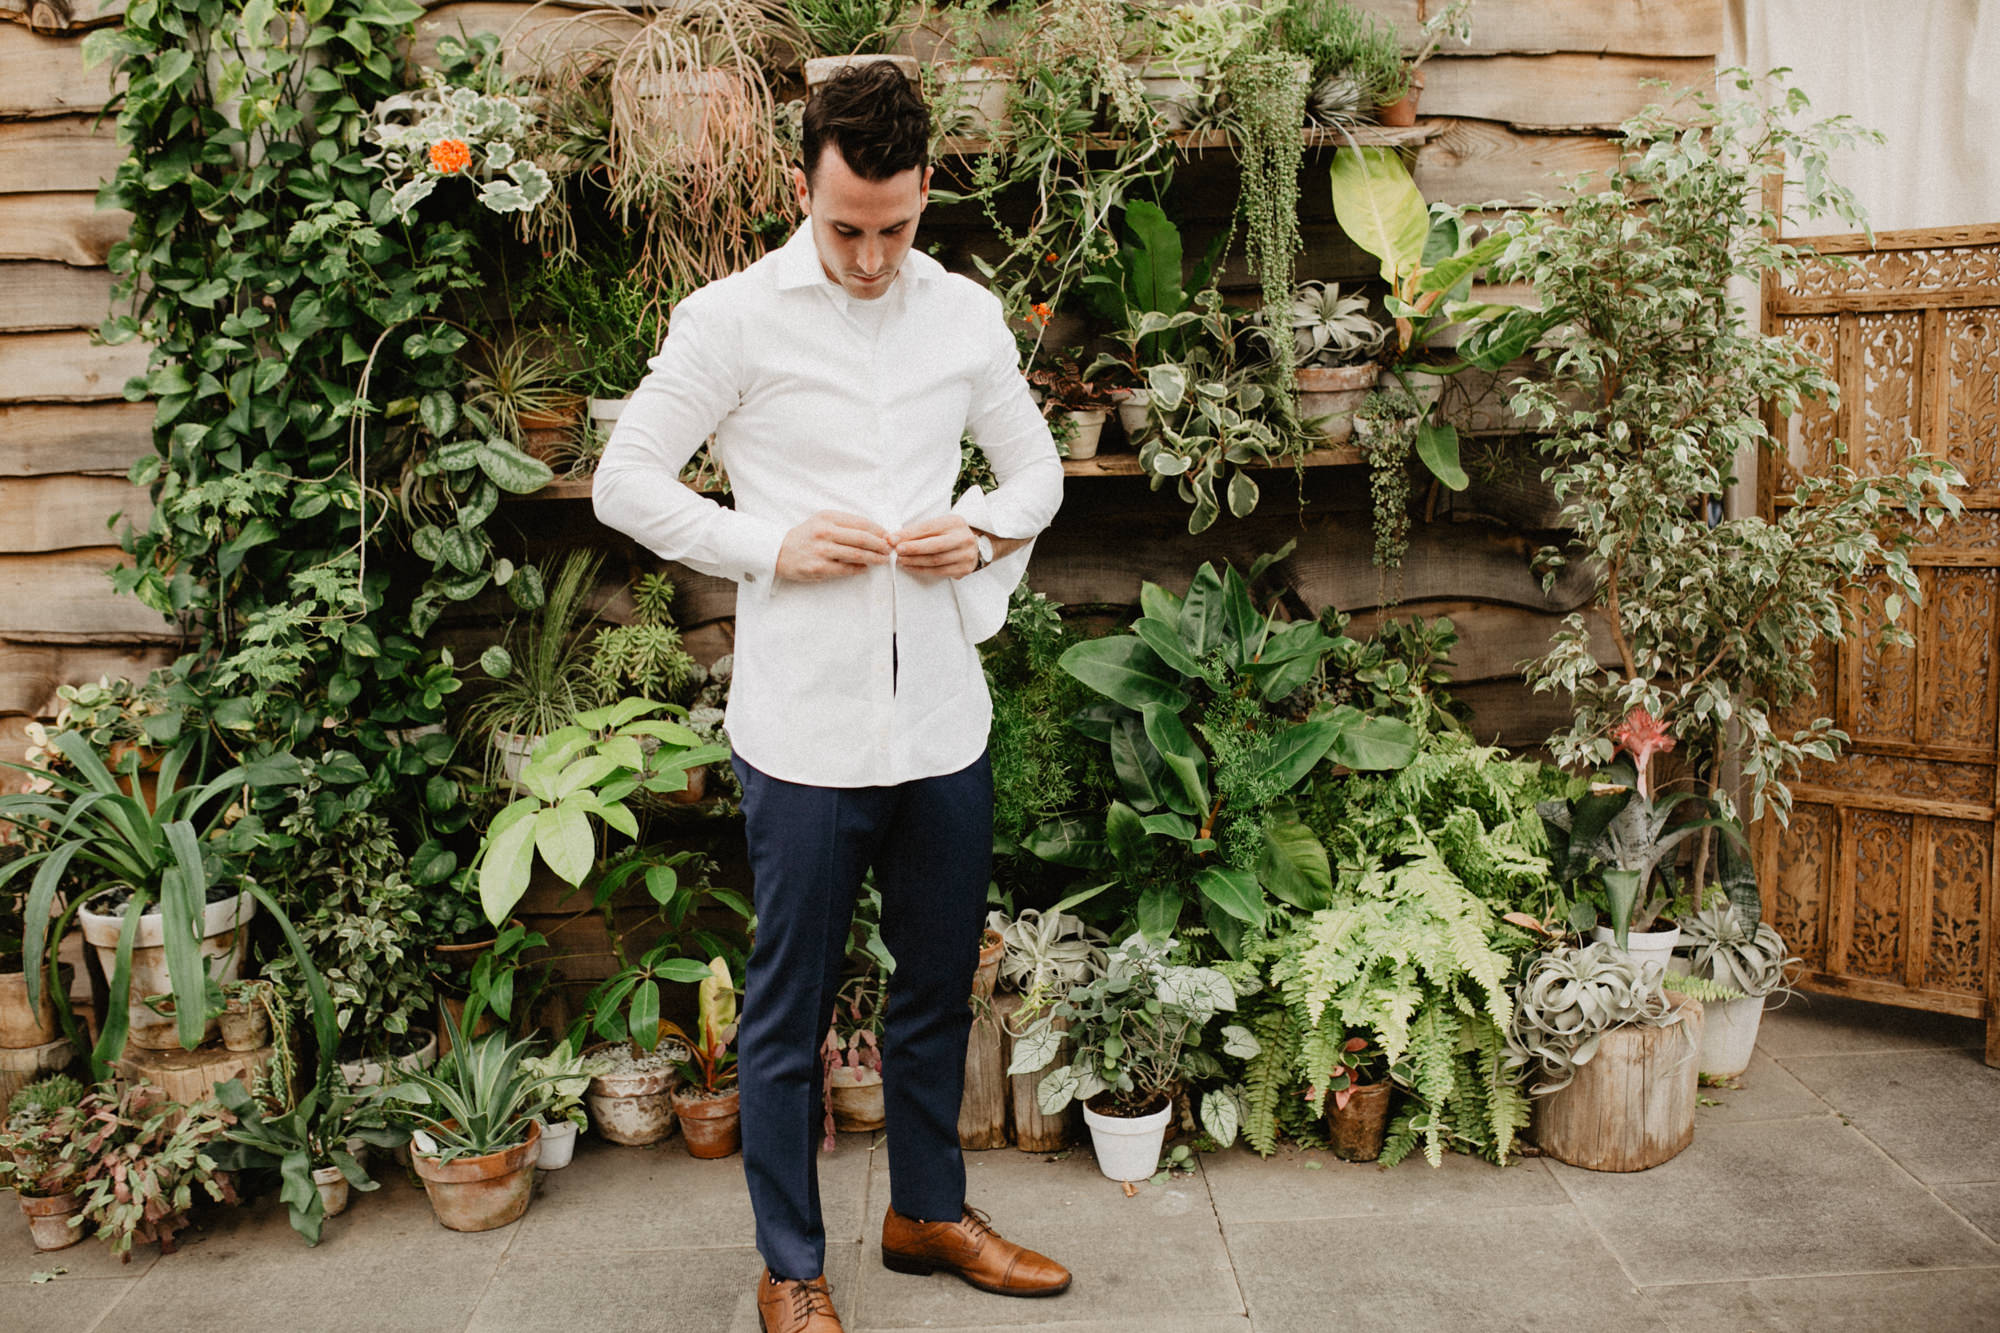 terrain-events-wedding-photographer-16.jpg